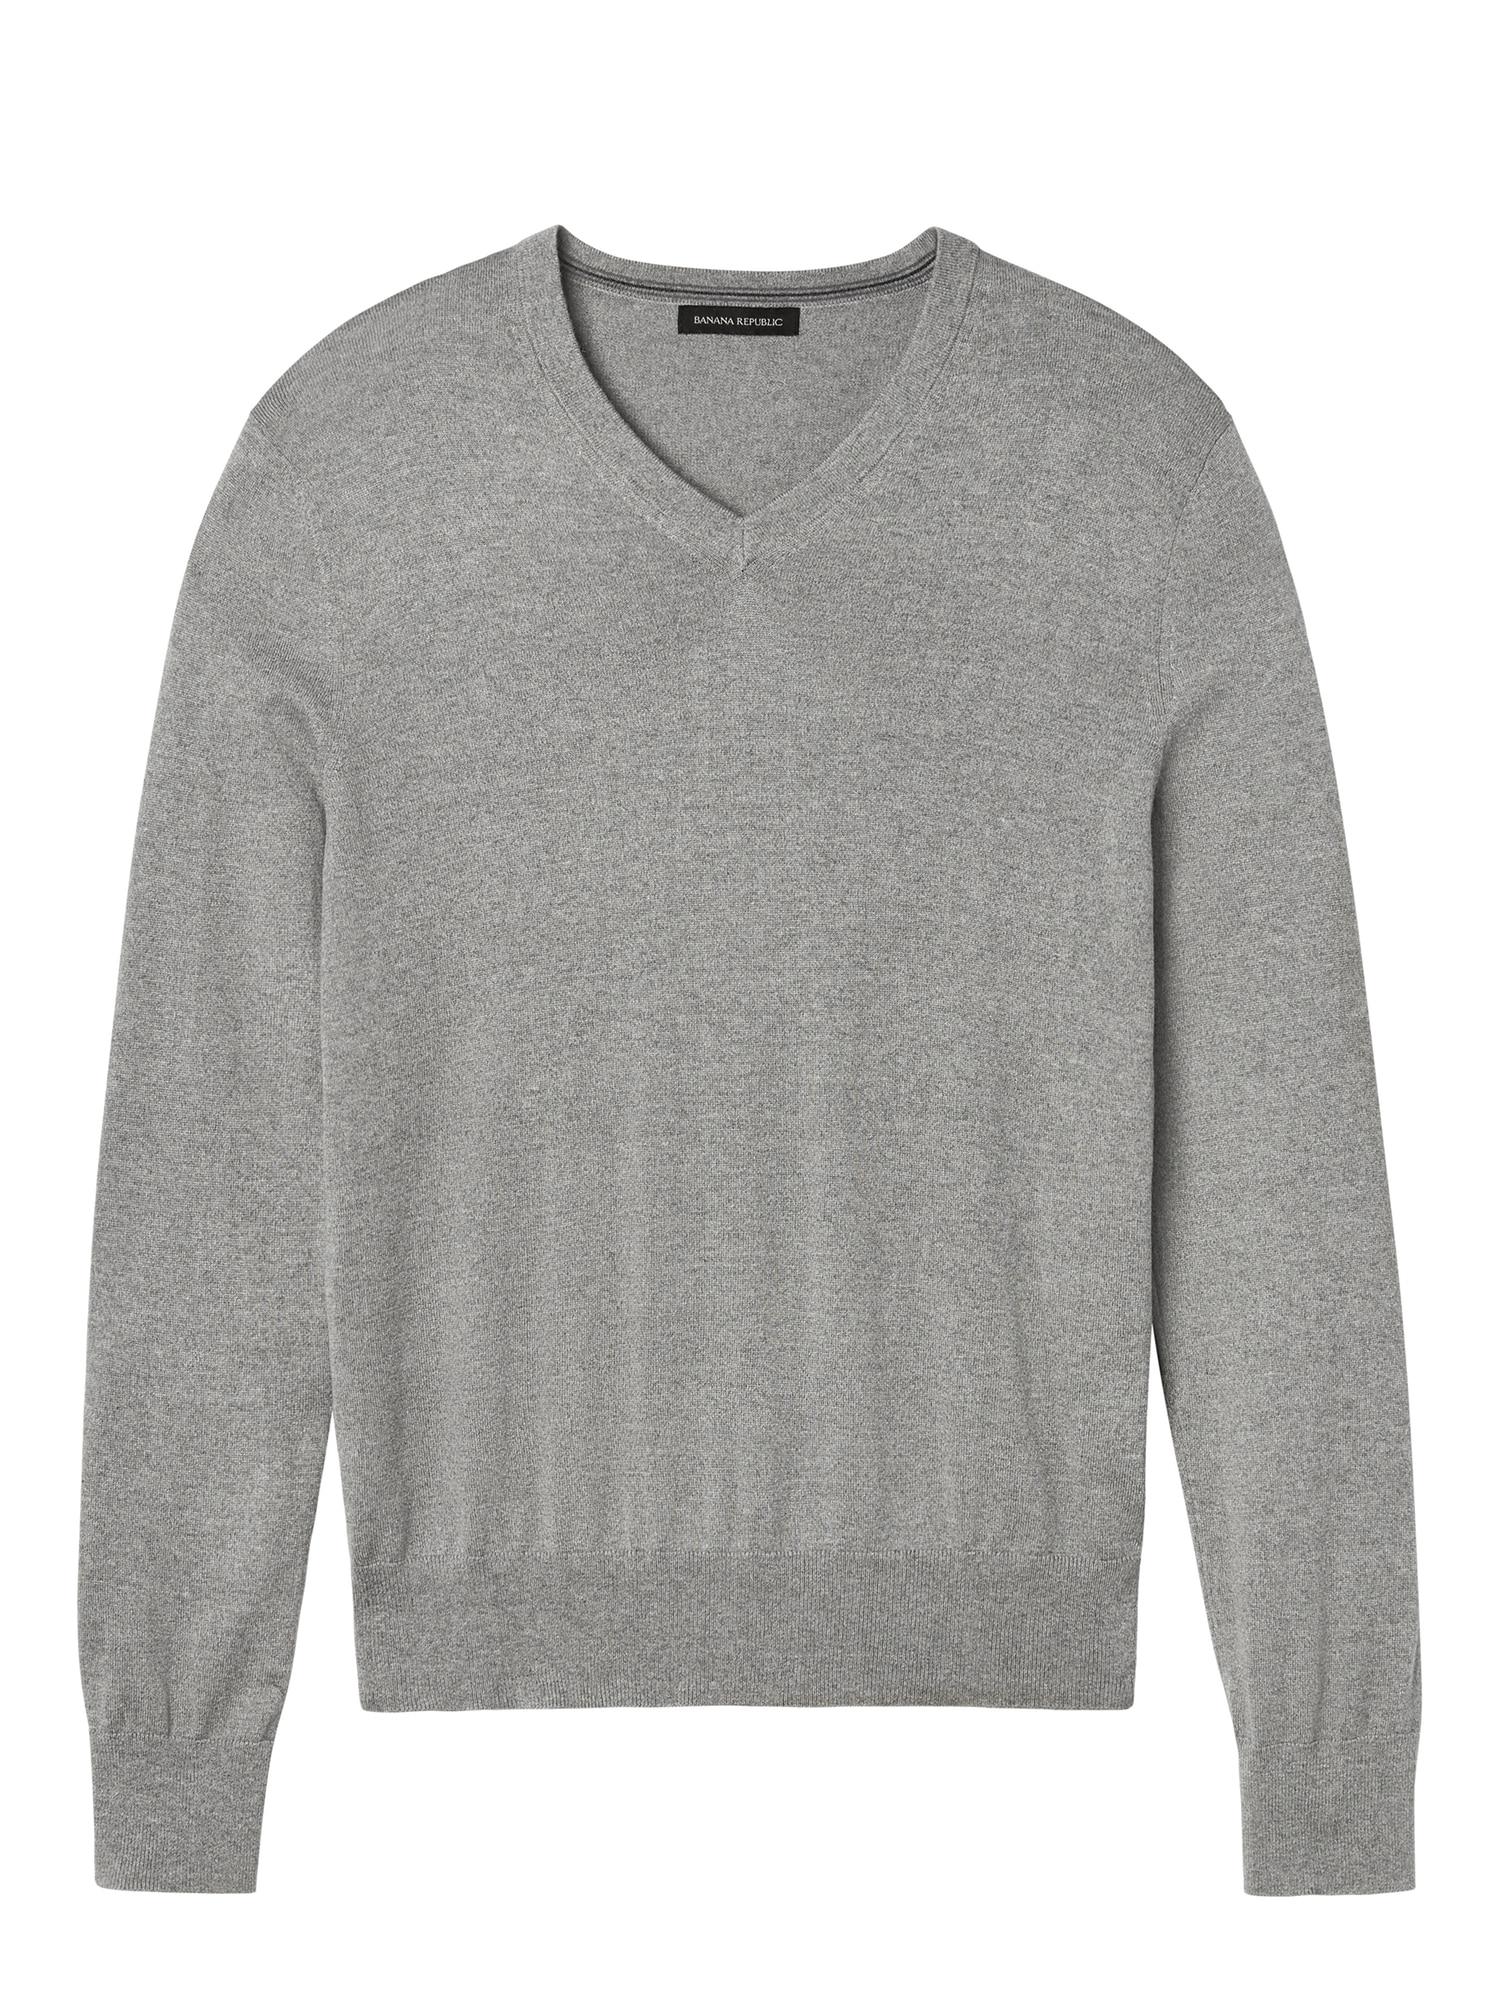 Silk Cotton Cashmere V Neck Sweater (Smoke Gray)